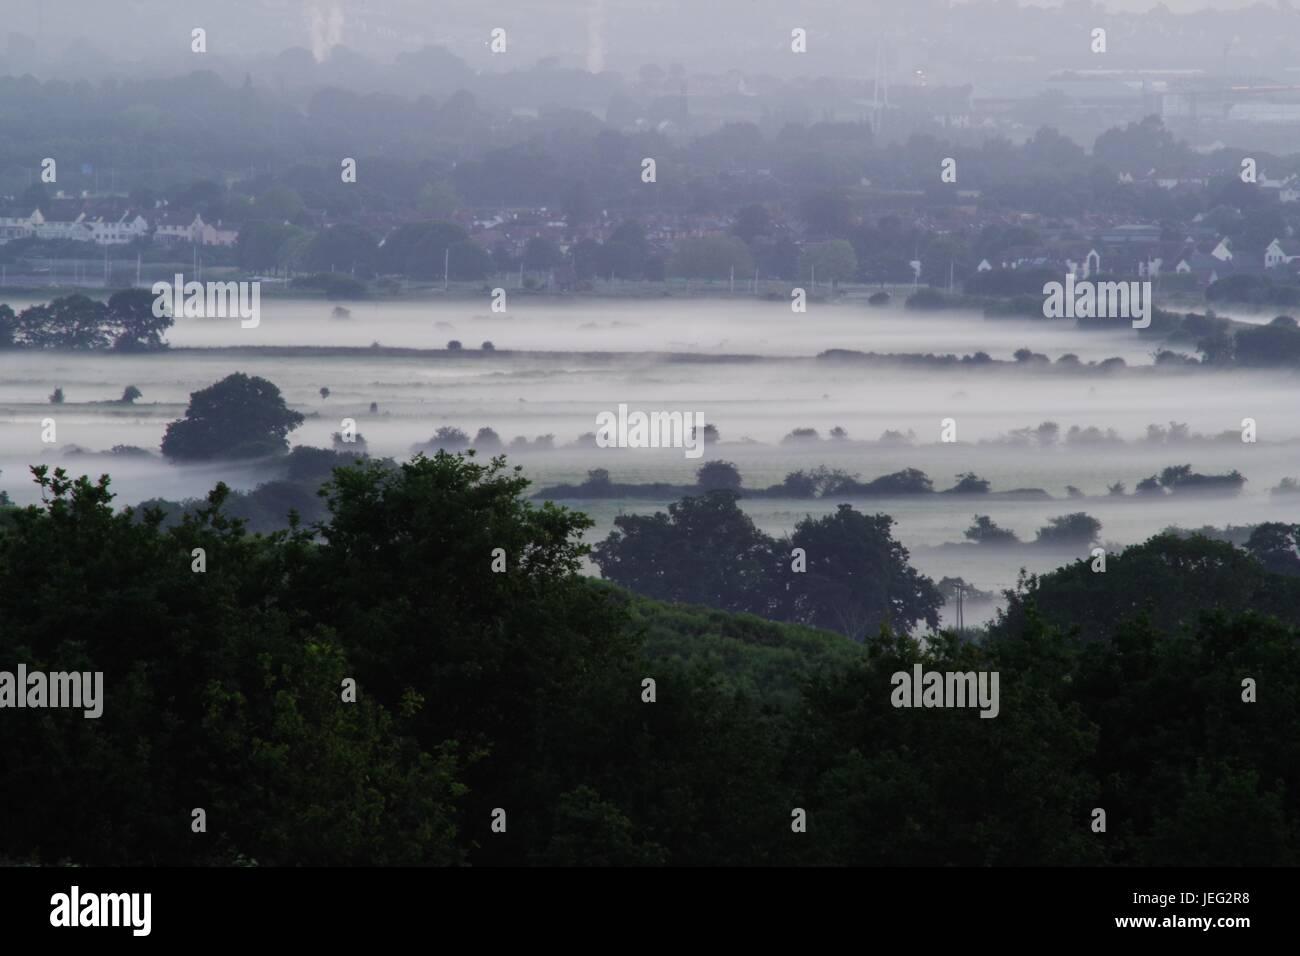 Morning Mist Hangs Gloomily Over Exminster Marshes, South of Exeter. Devon, UK. June, 2017. - Stock Image